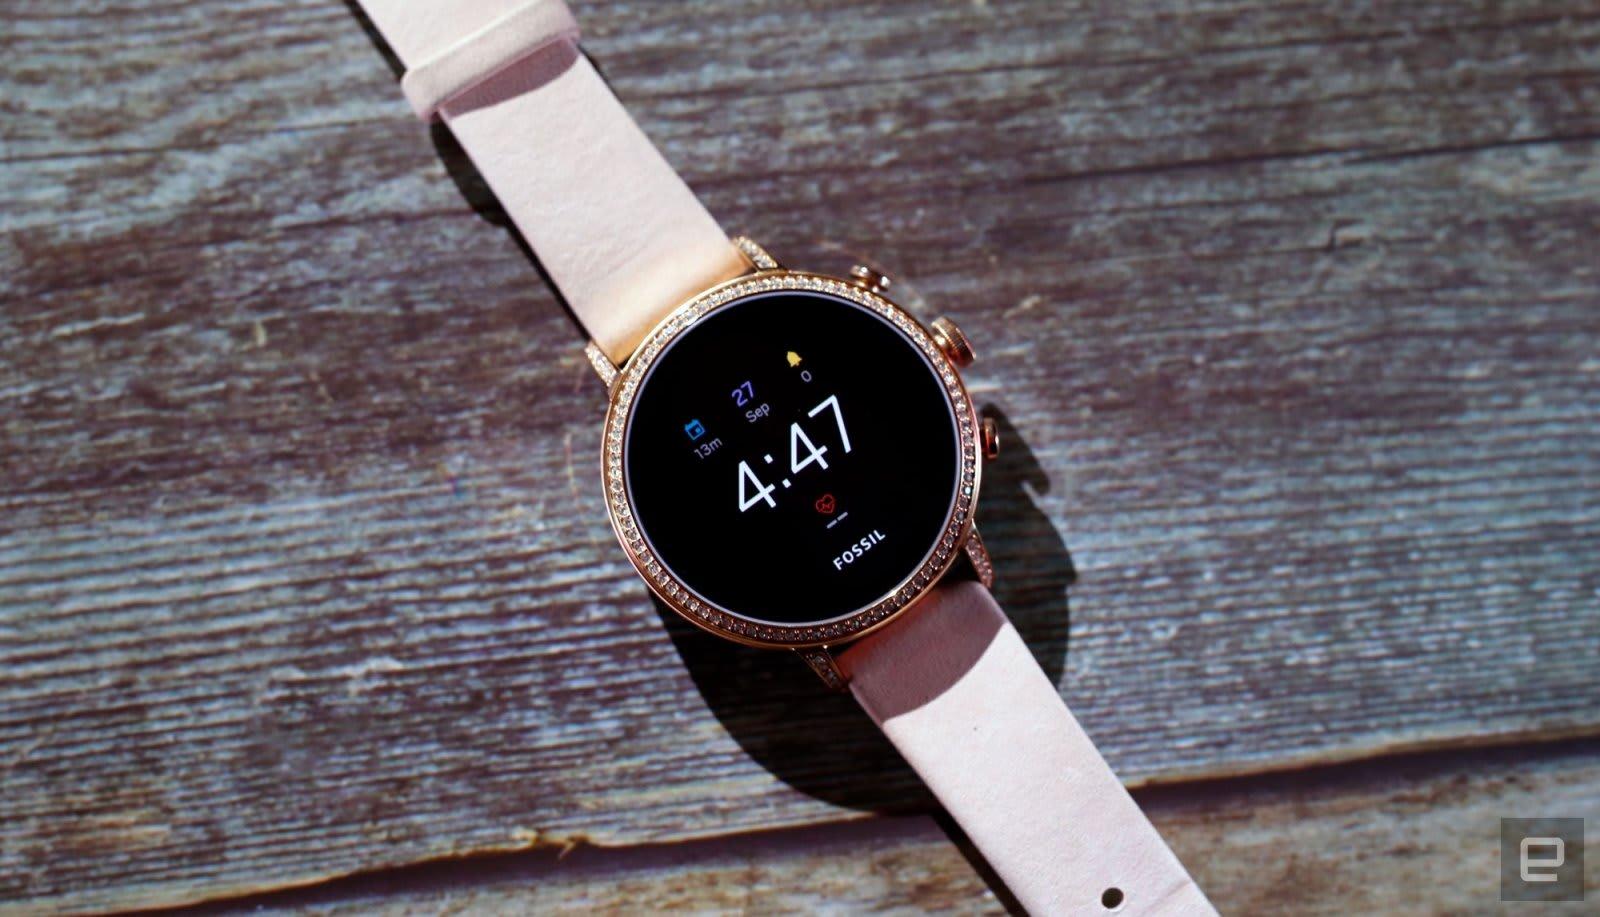 Wear OS on Fossil watch